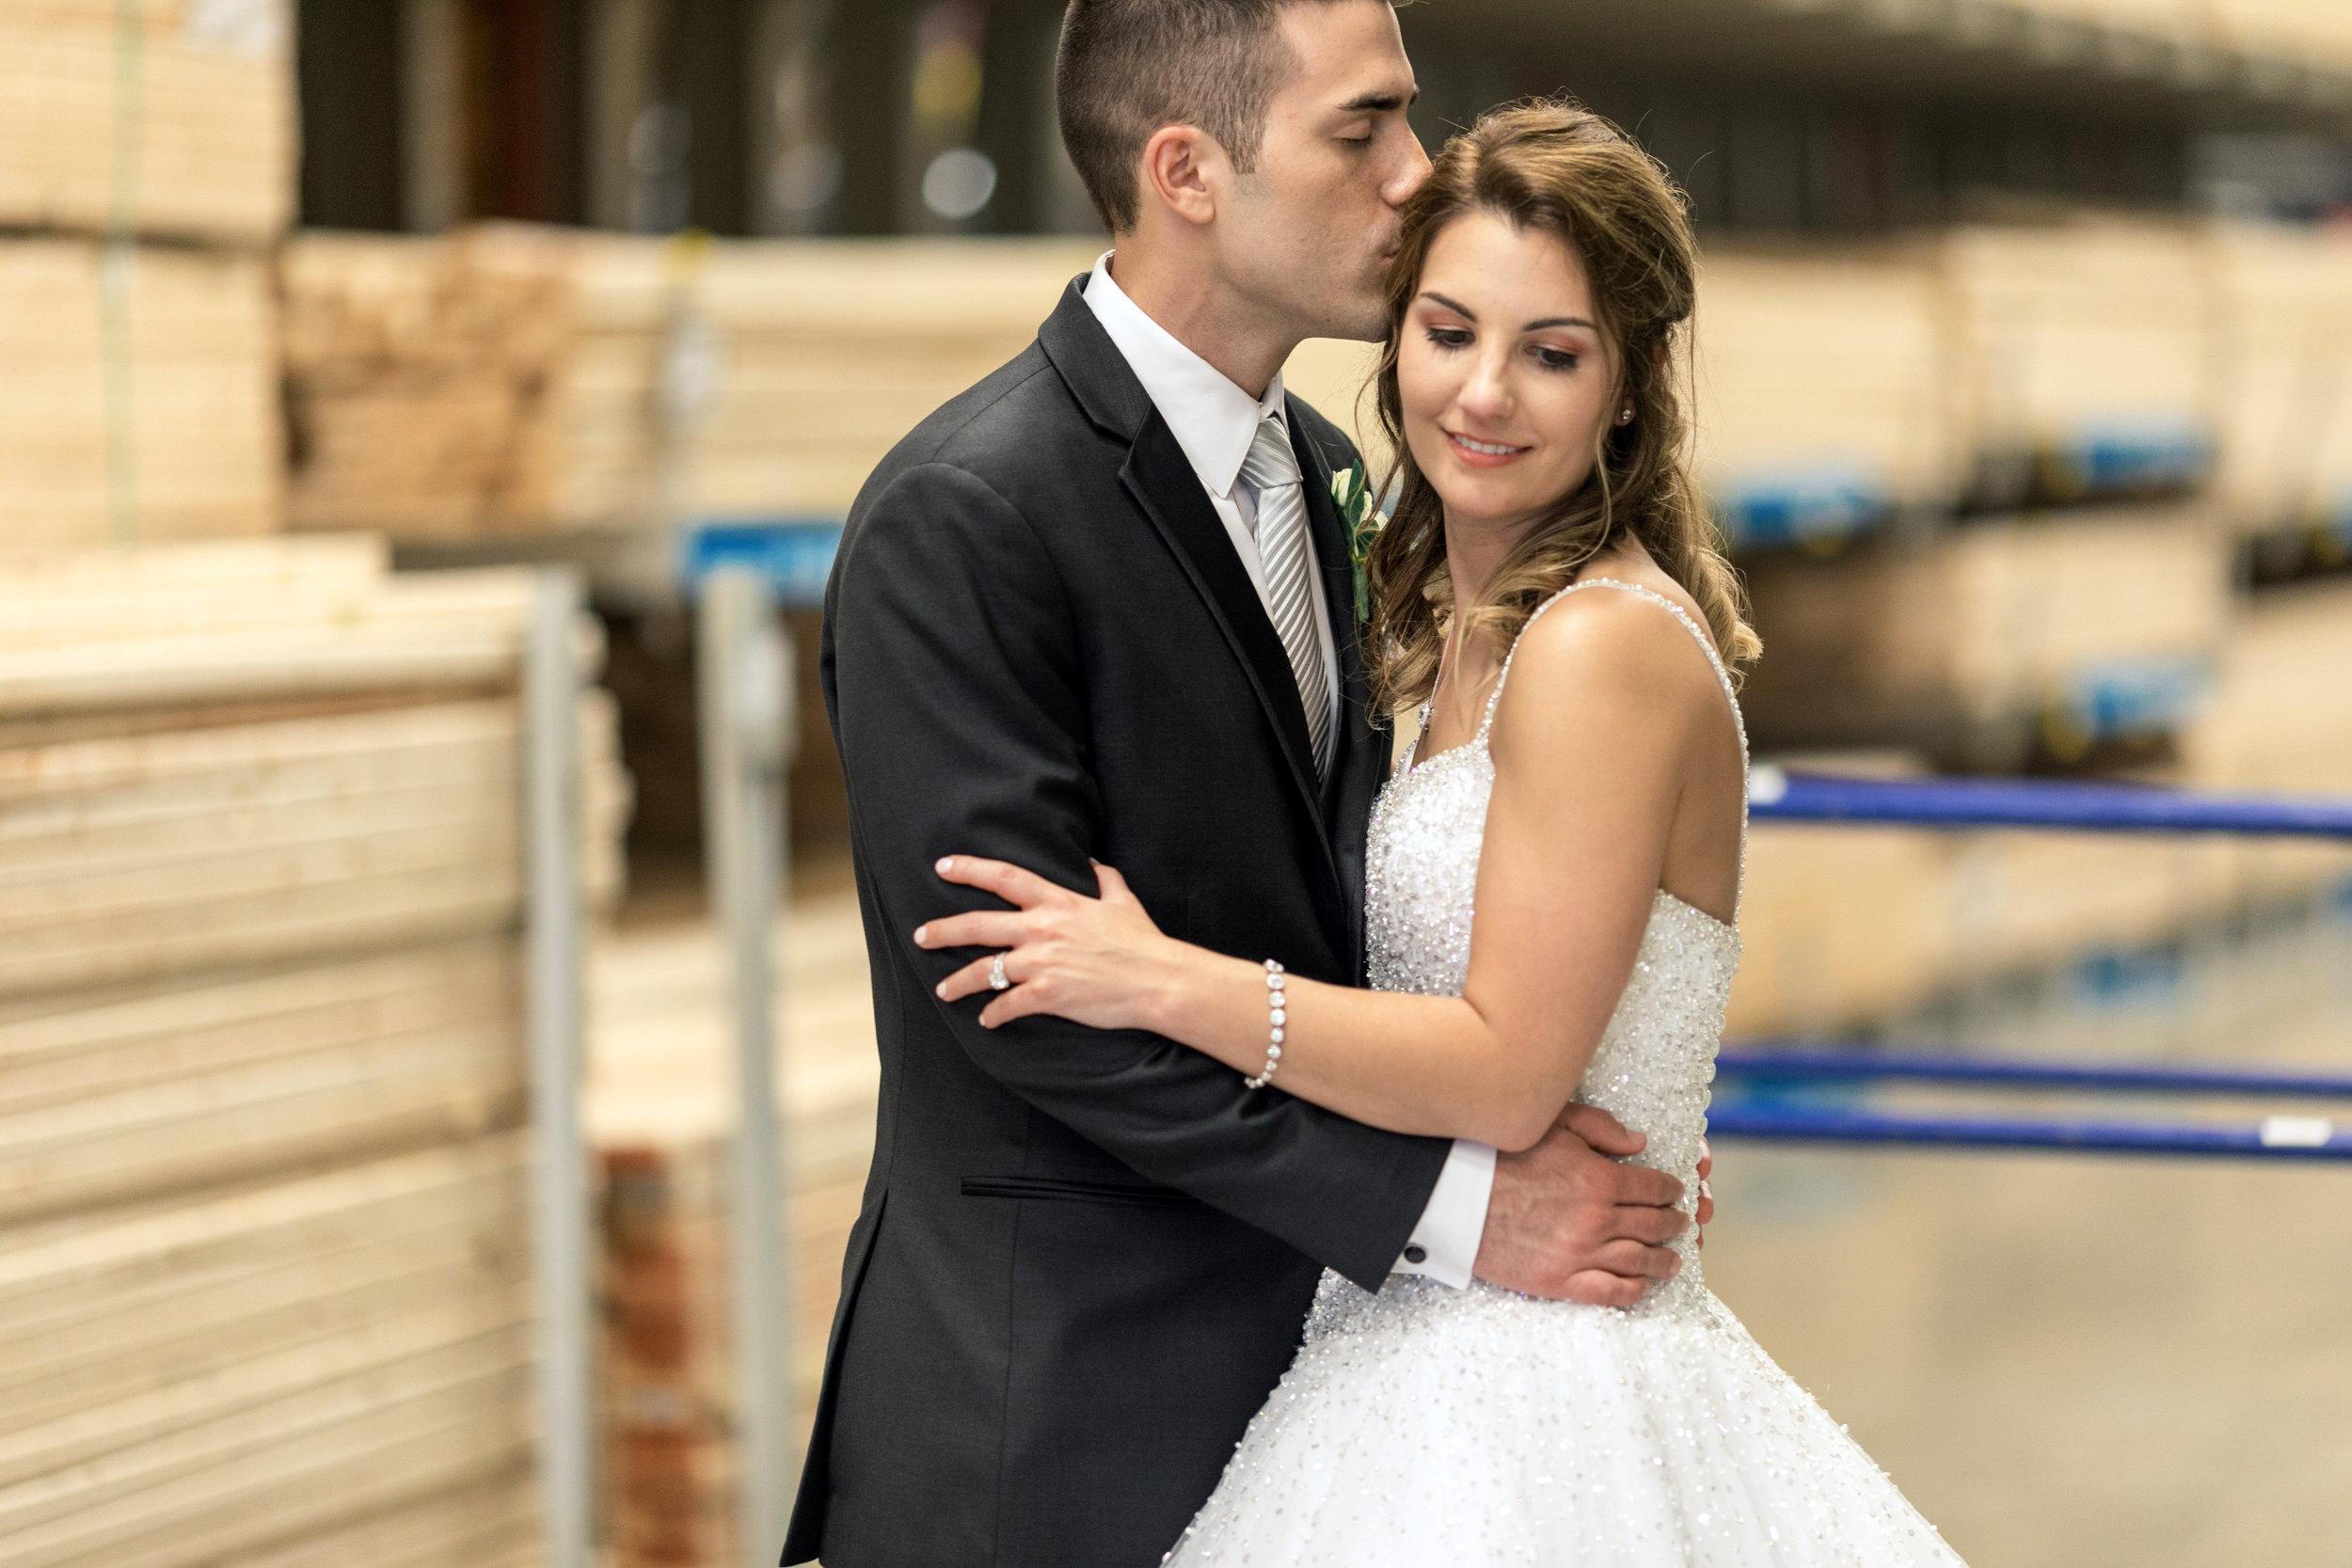 Wedding-couple-takes-photos-at-lowes-hardware-due-to-rain6.jpg